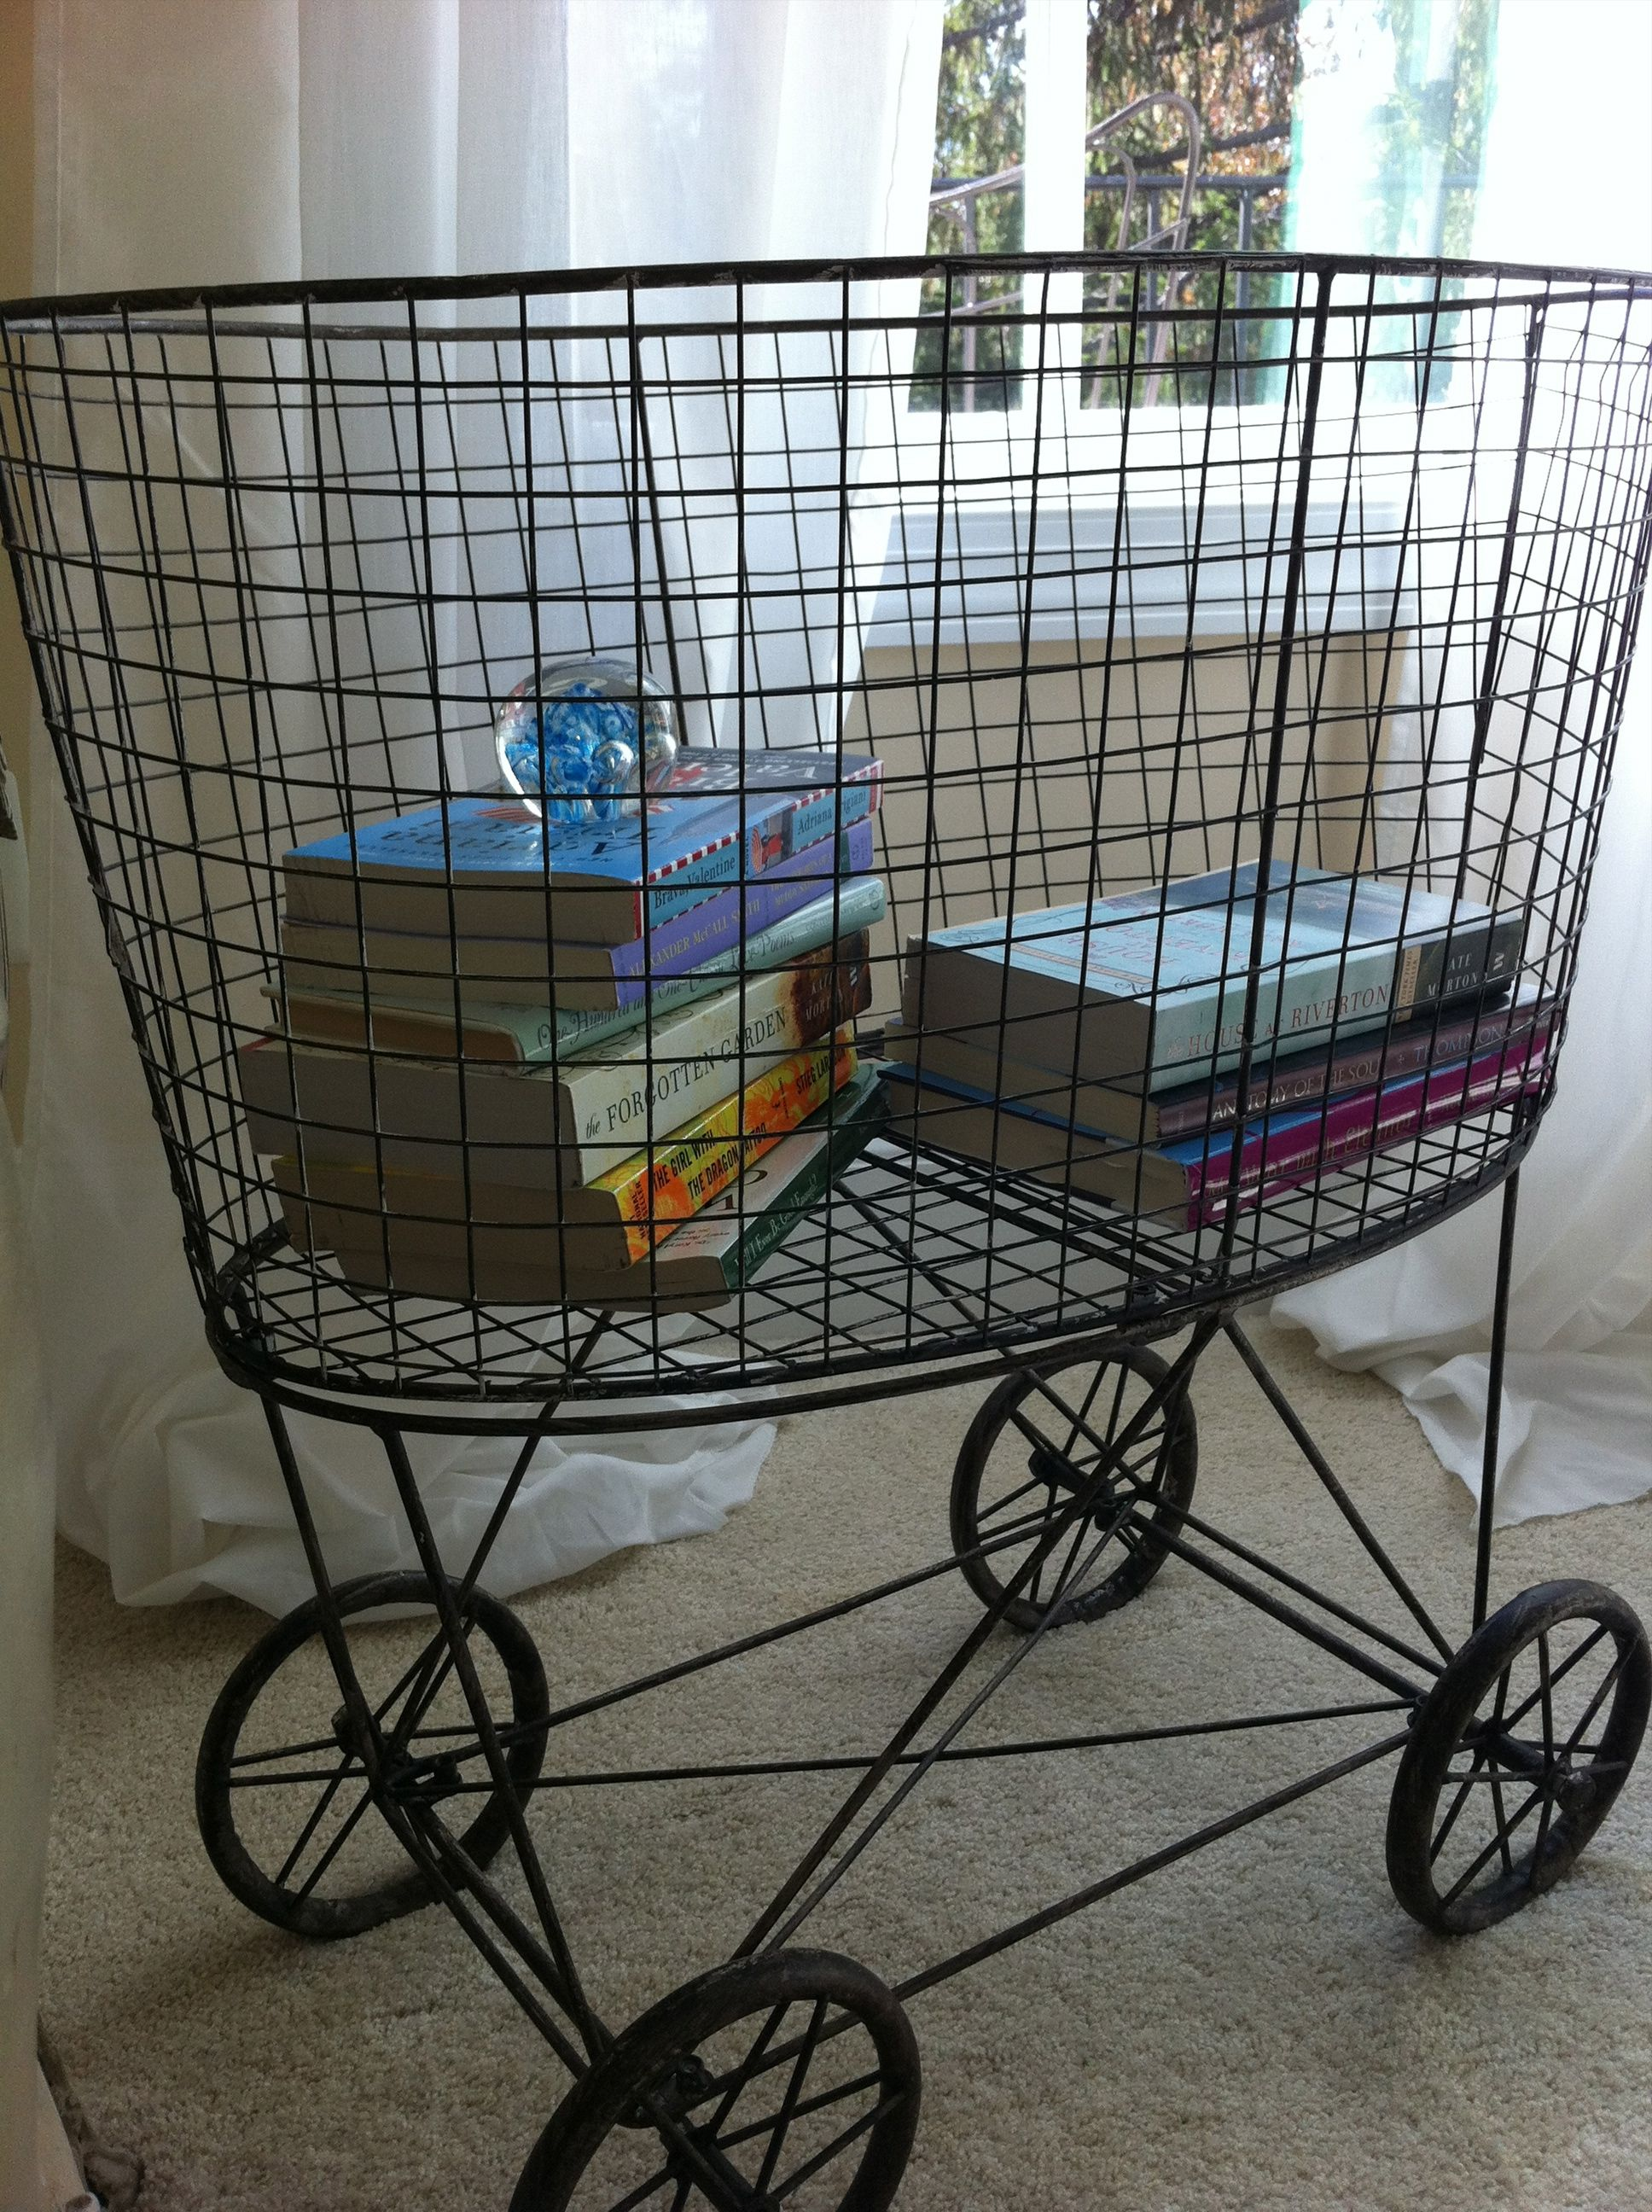 Repro Vintage Laundry Basket | Dreaming ♥ | Pinterest | Vintage ...